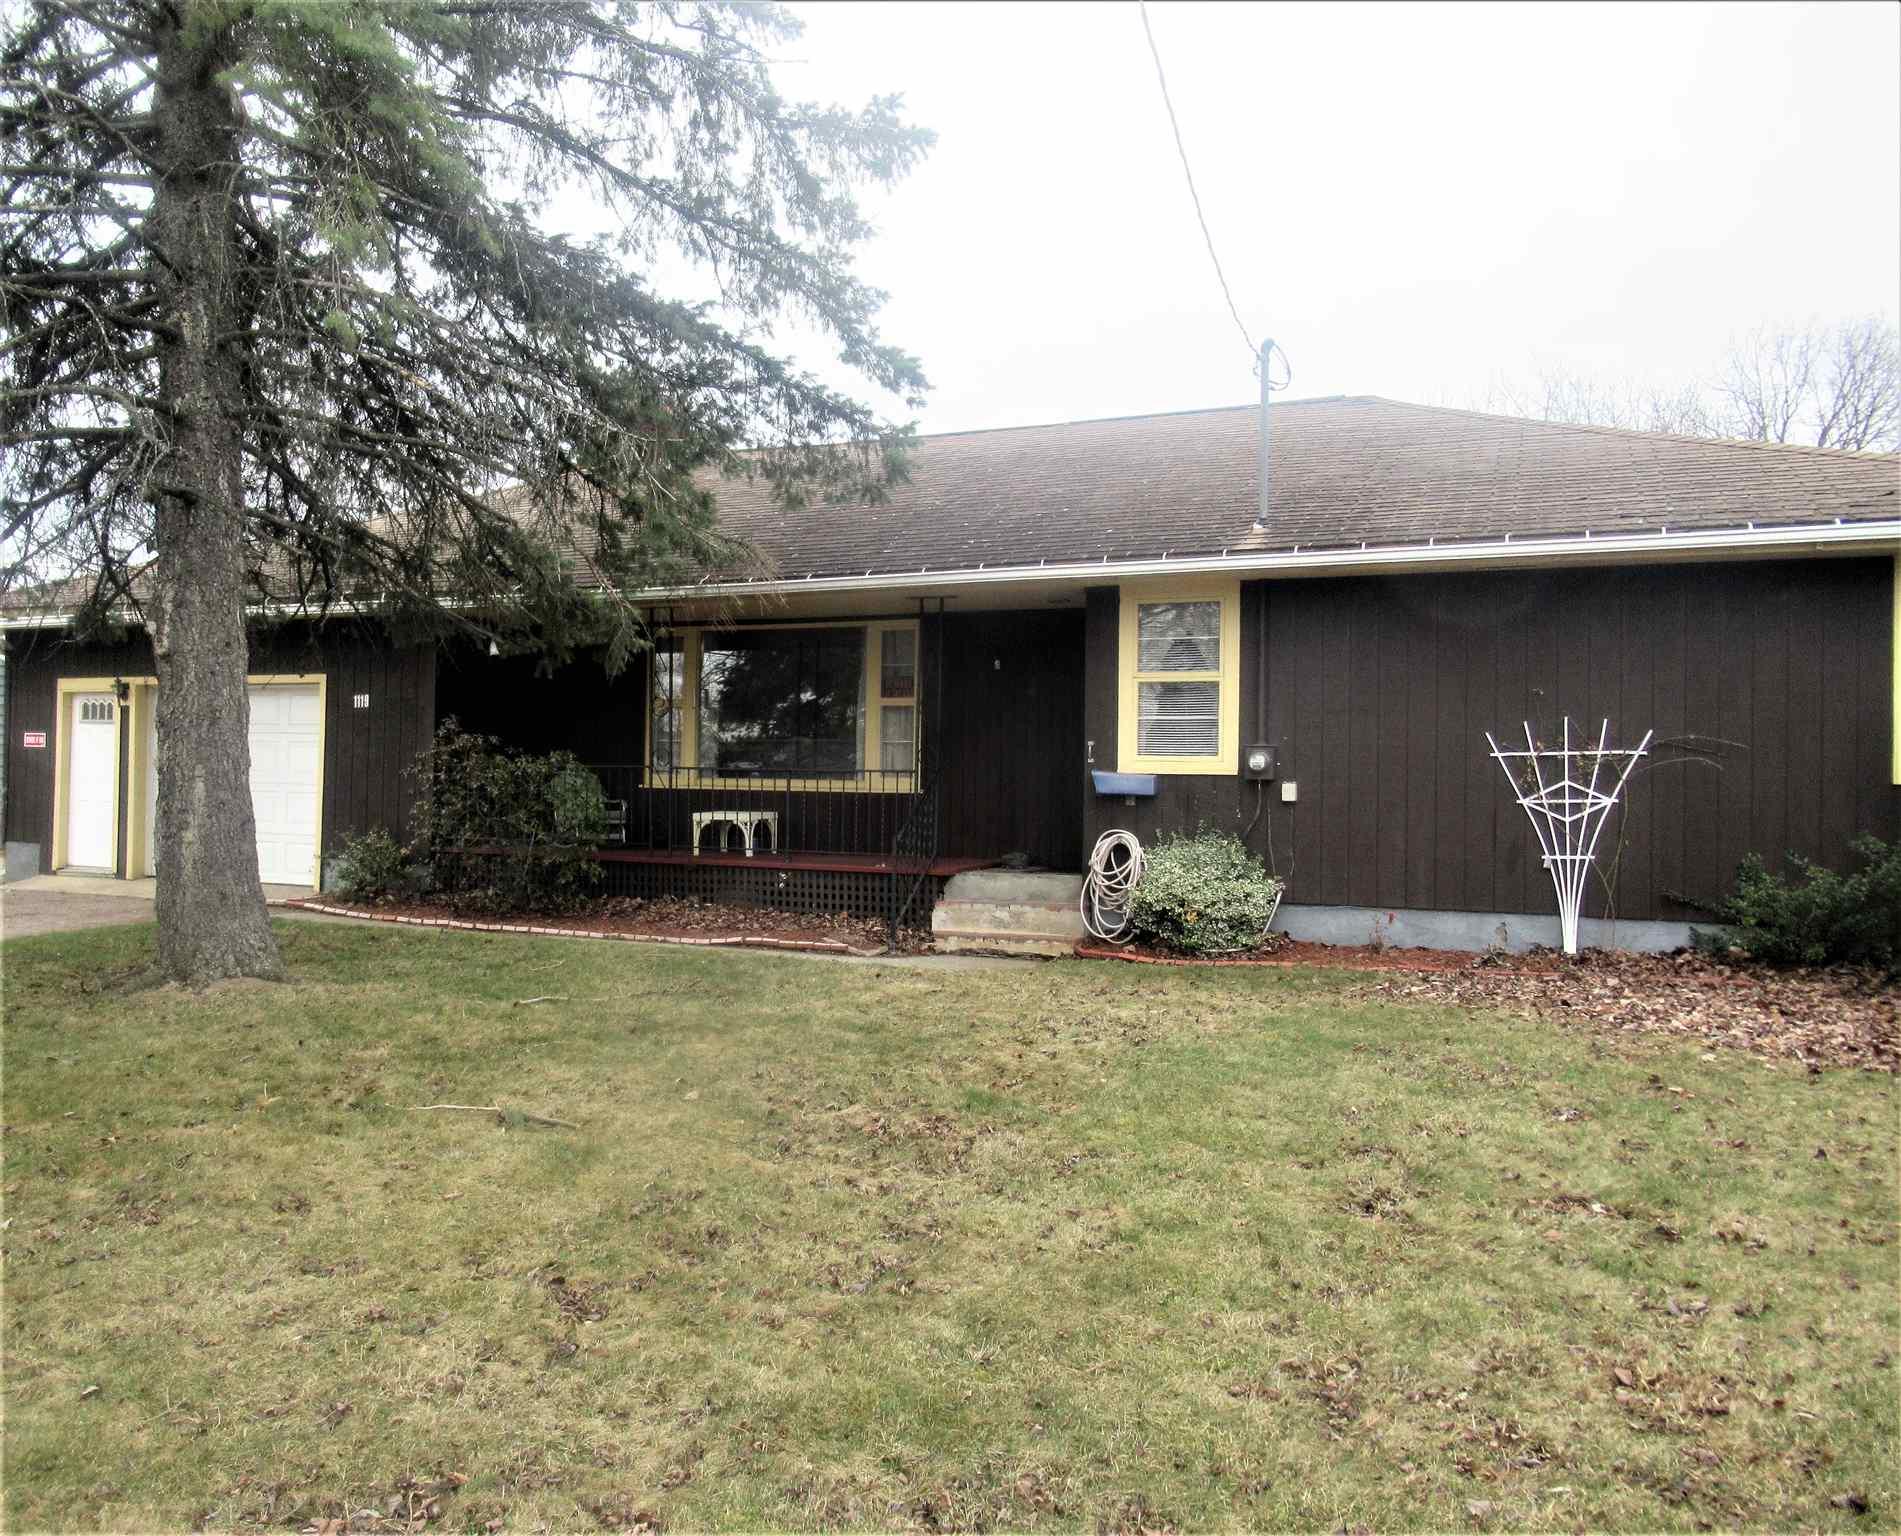 1119 Pine Street, Burlington, Vermont 05401, 3 Bedrooms Bedrooms, ,1 BathroomBathrooms,Single Family,For Sale,1119 Pine Street,1,4854824